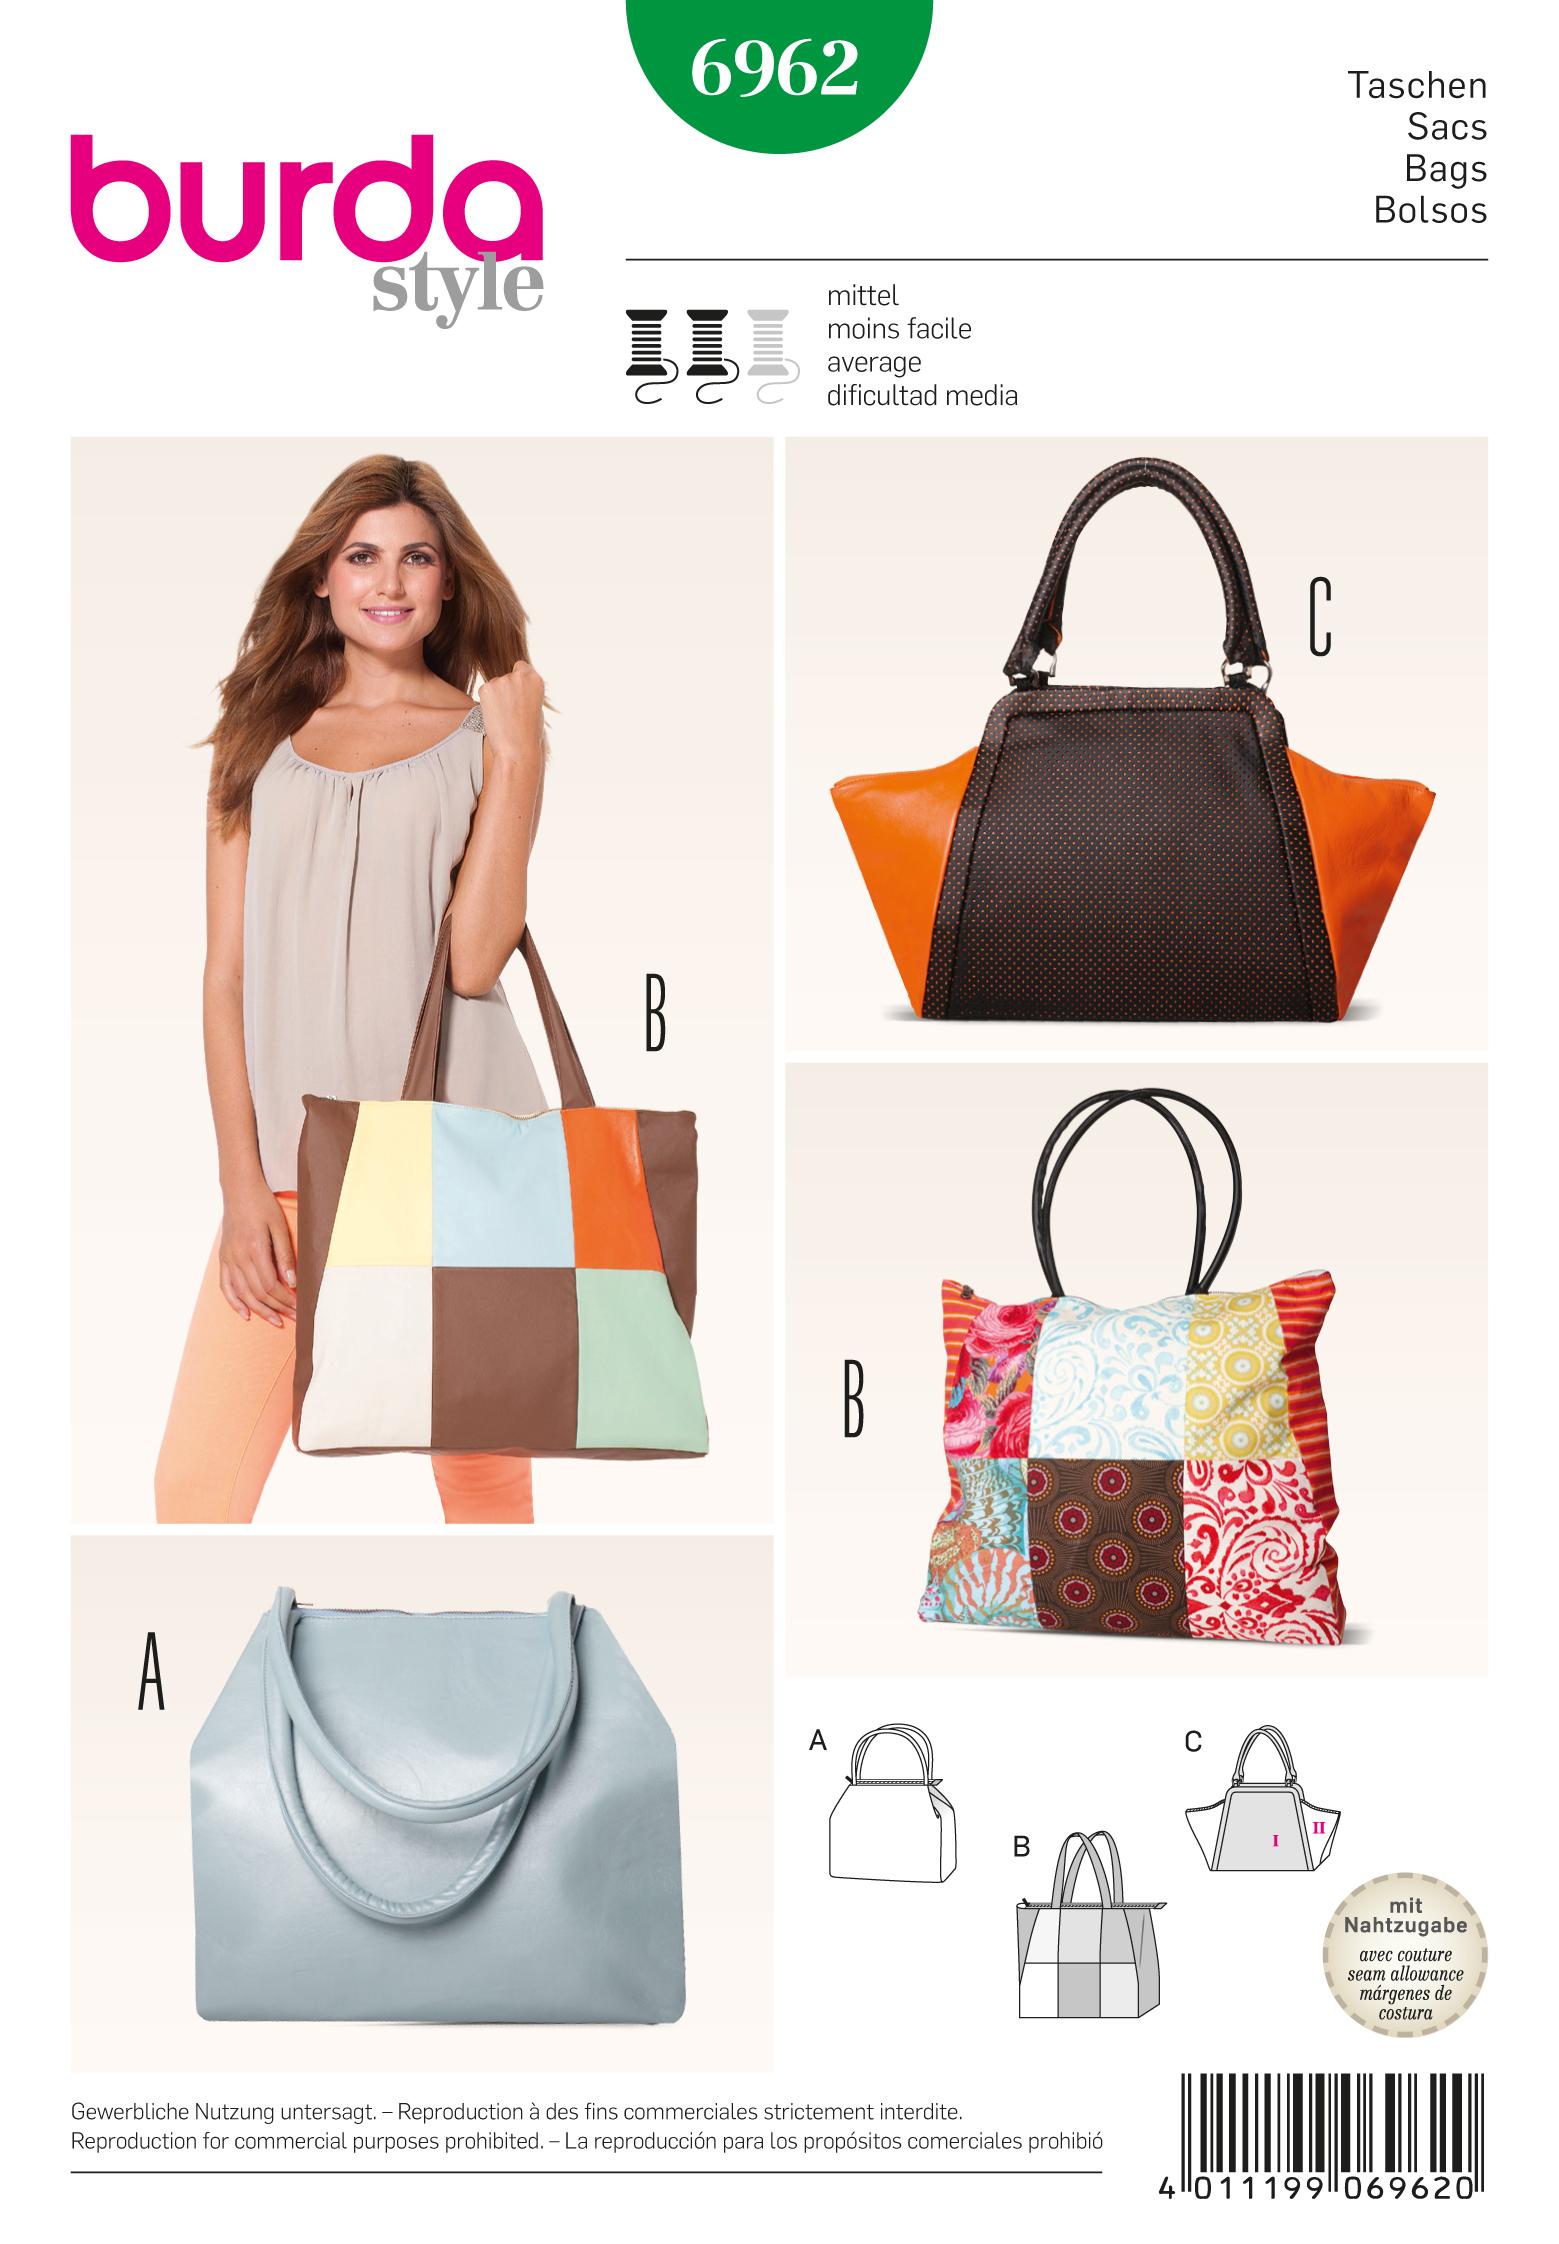 Burda Bags 6962